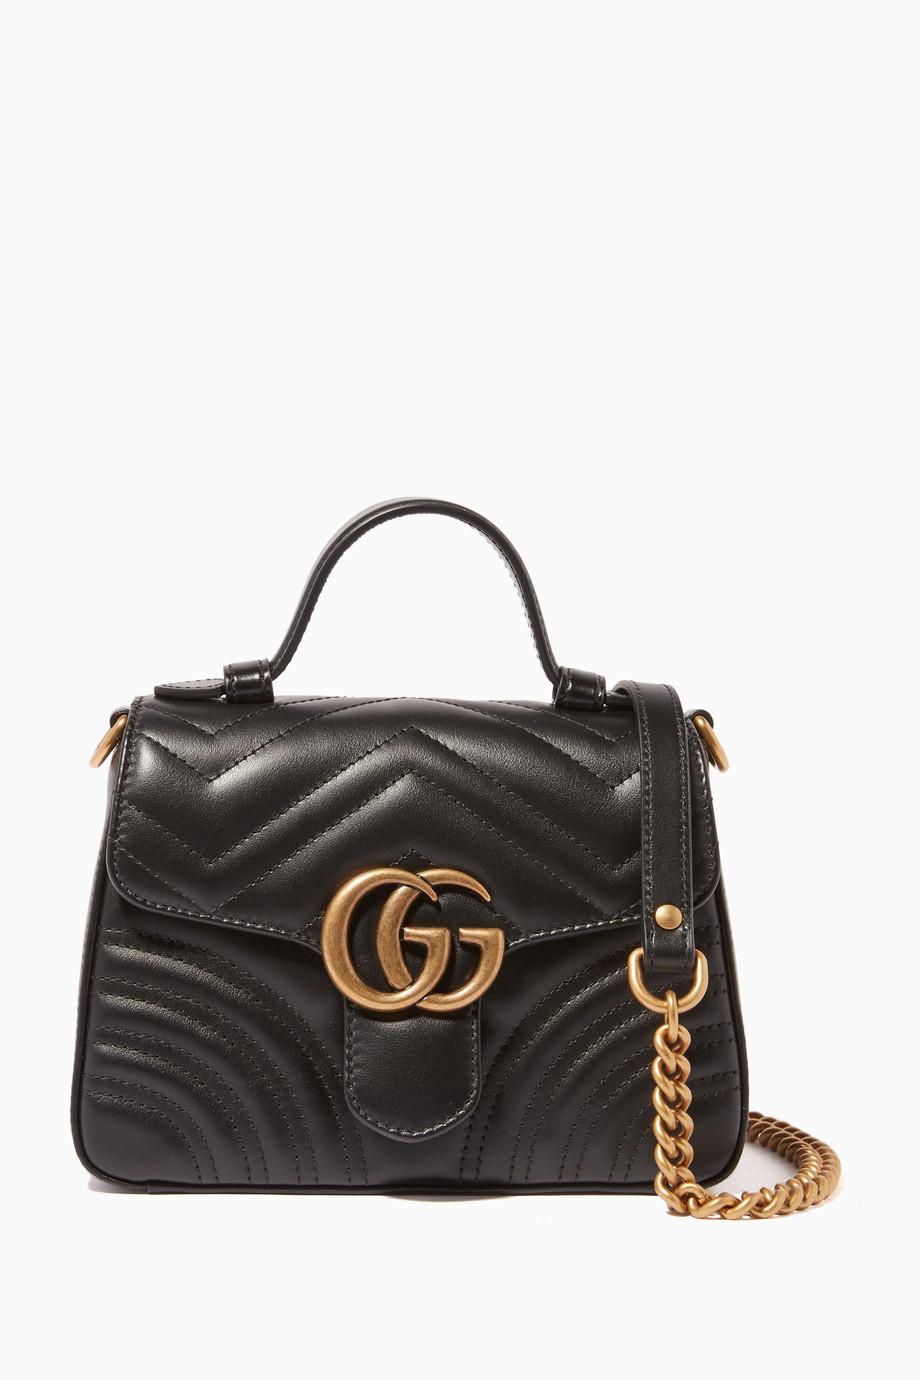 3b3b6b0dd Shop Gucci Black GG Marmont 2.0 Mini Bag for Women | Ounass Kuwait